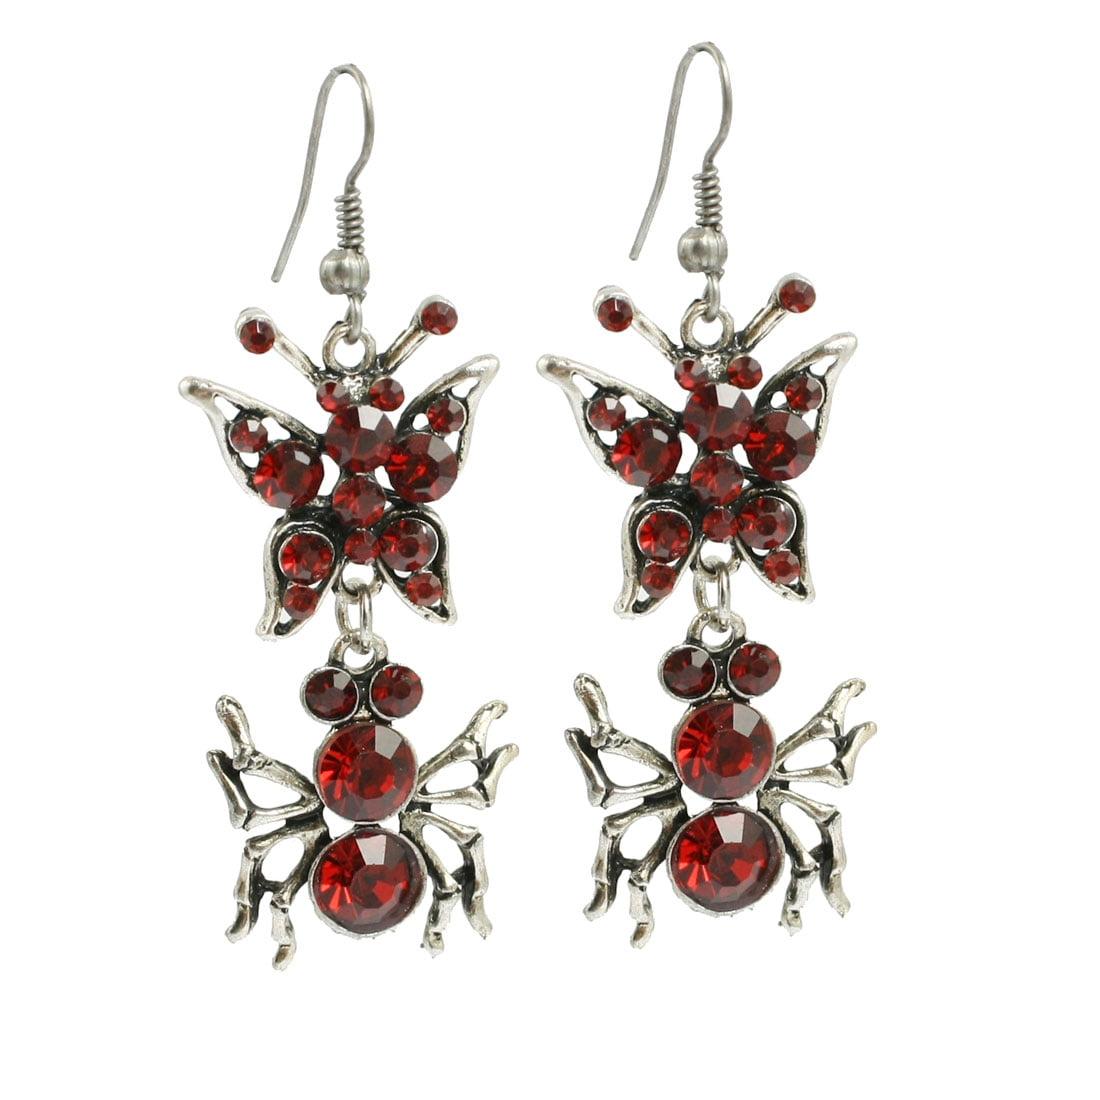 Red Plastic Rhinestone Decor Spider Dangling Ear Hook Earrings Pair